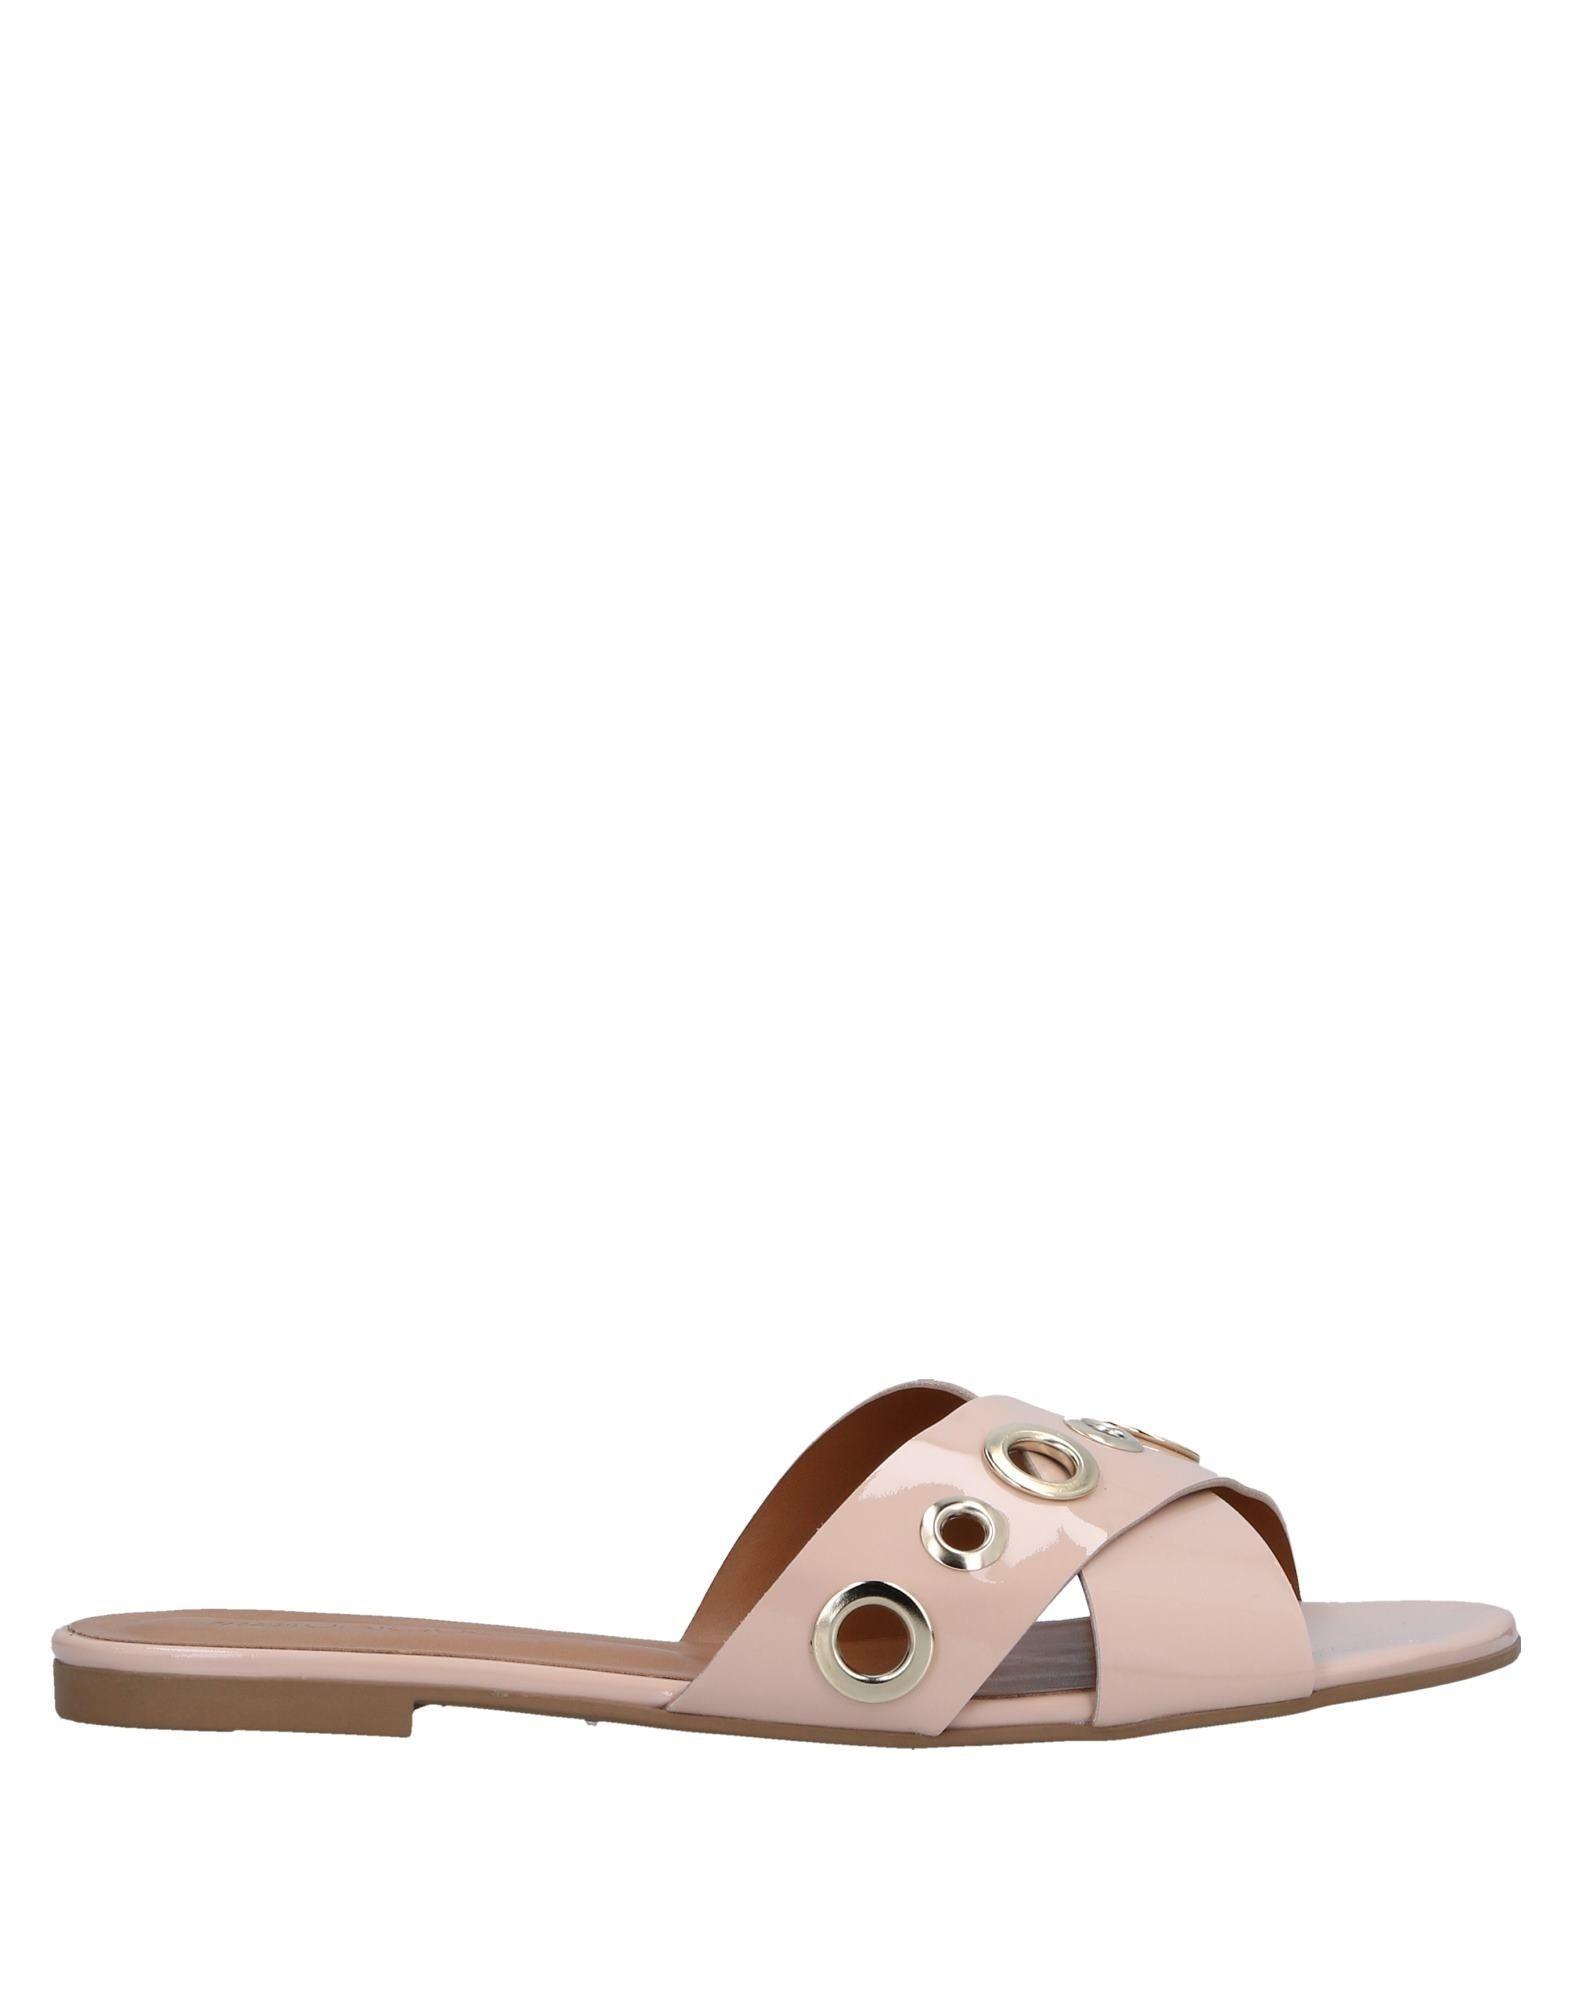 Miss Unique Sandalen Damen  11533270VW Gute Qualität beliebte Schuhe